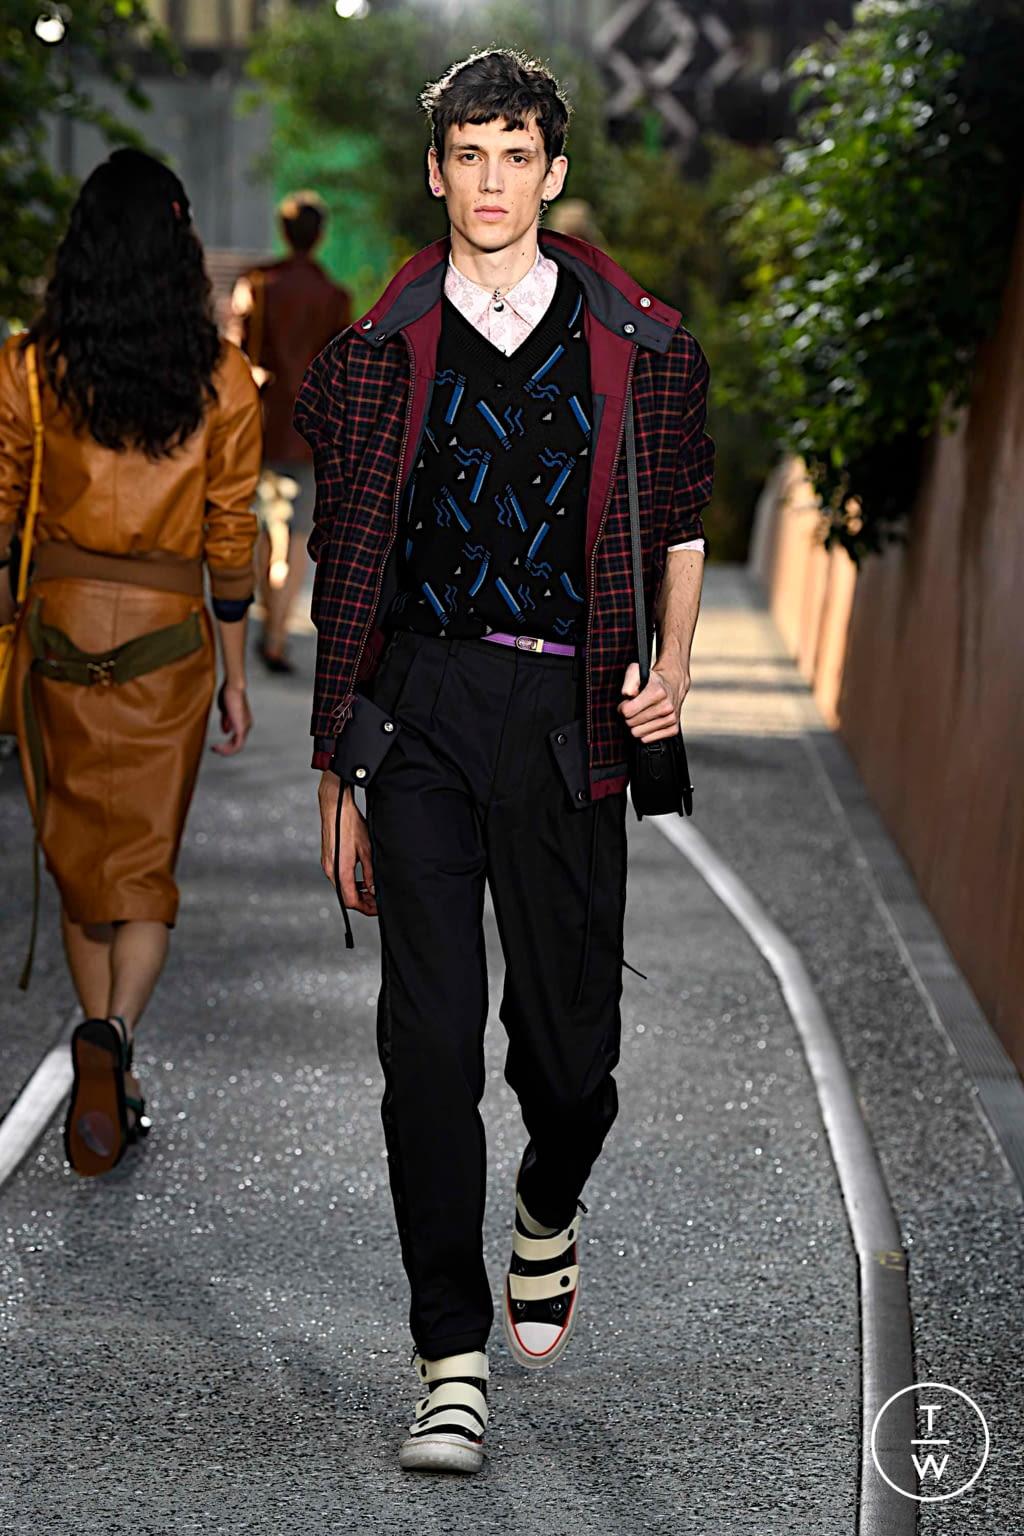 Fashion Week New York Spring/Summer 2020 look 31 de la collection Coach 1941 womenswear